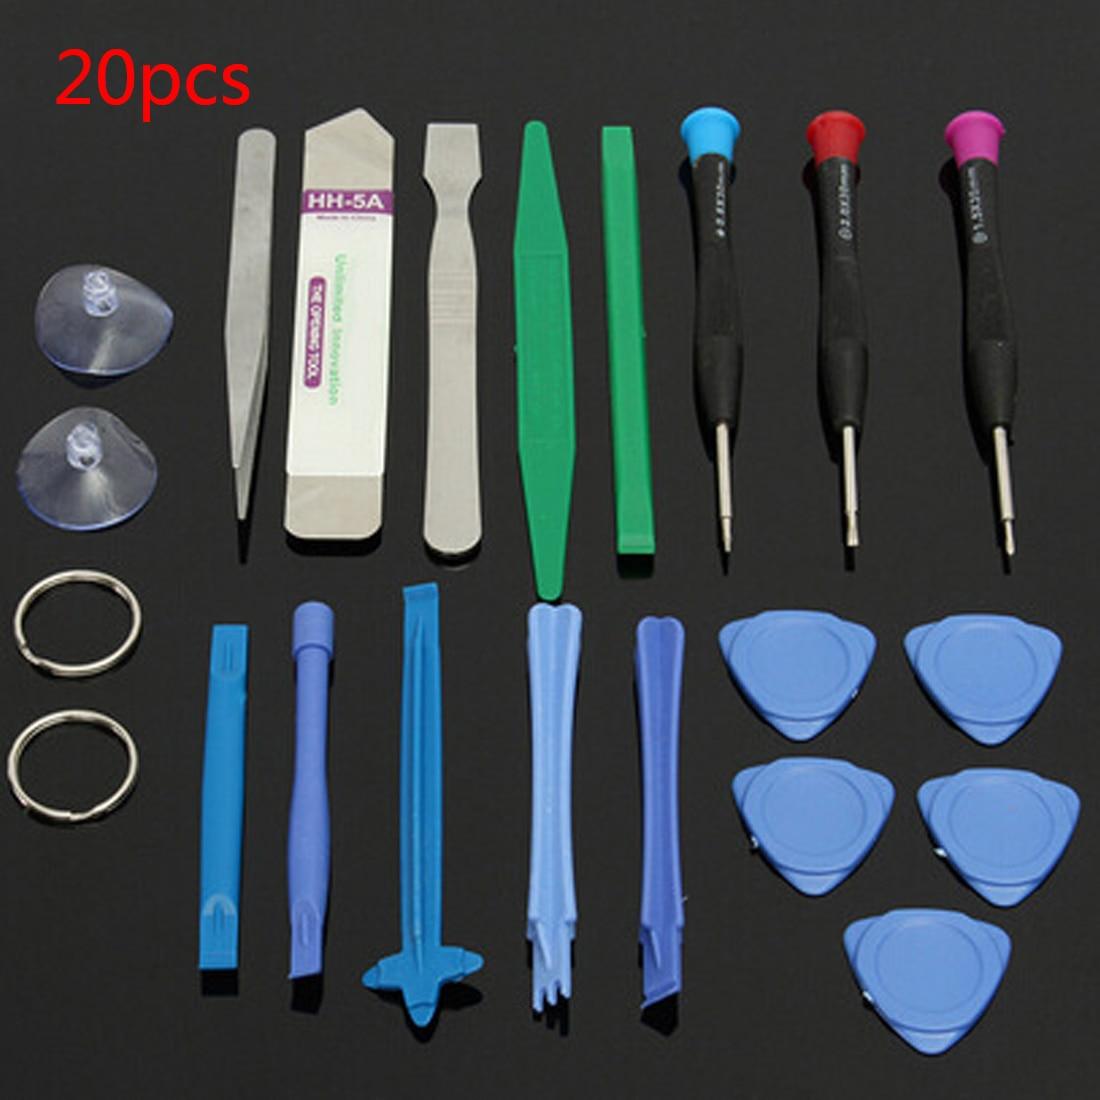 20 In 1 Pry Spudger Screen Opening Tool Outils Screwdriver Tweezers Set Mobile Phone Repair Kit For IPad IPhone 4 4s 5 5s 6 Plus